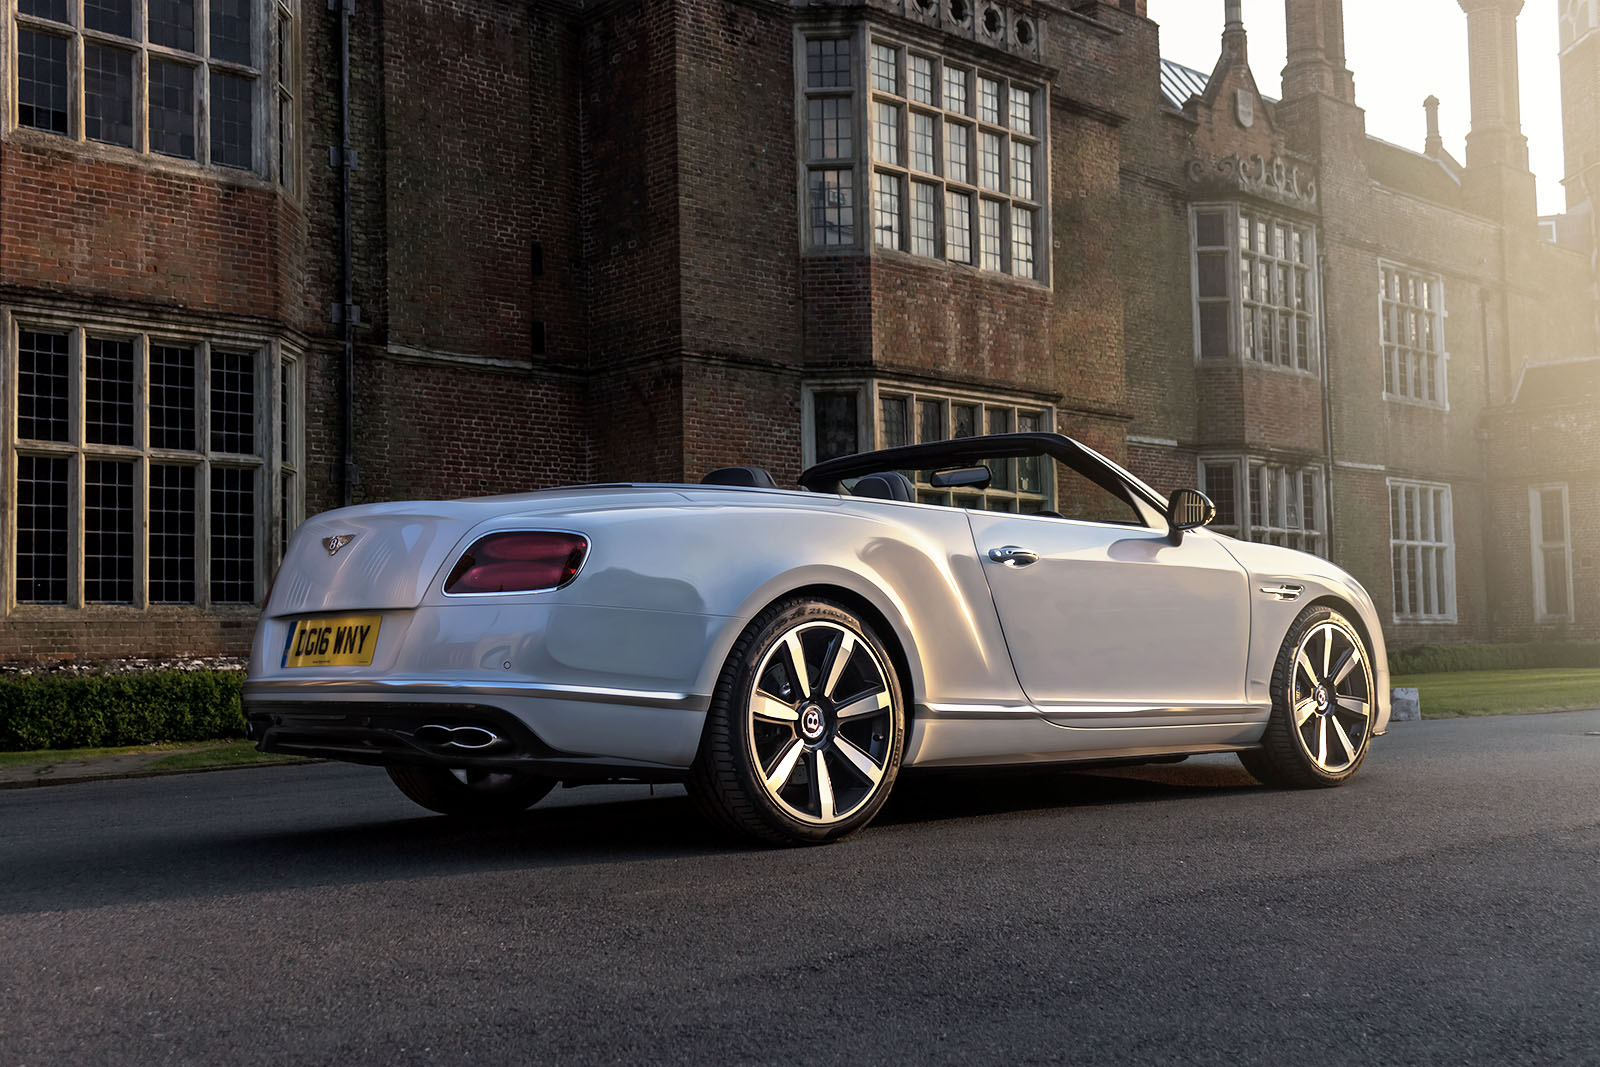 Top Down in The Bentley GTC V8S 4